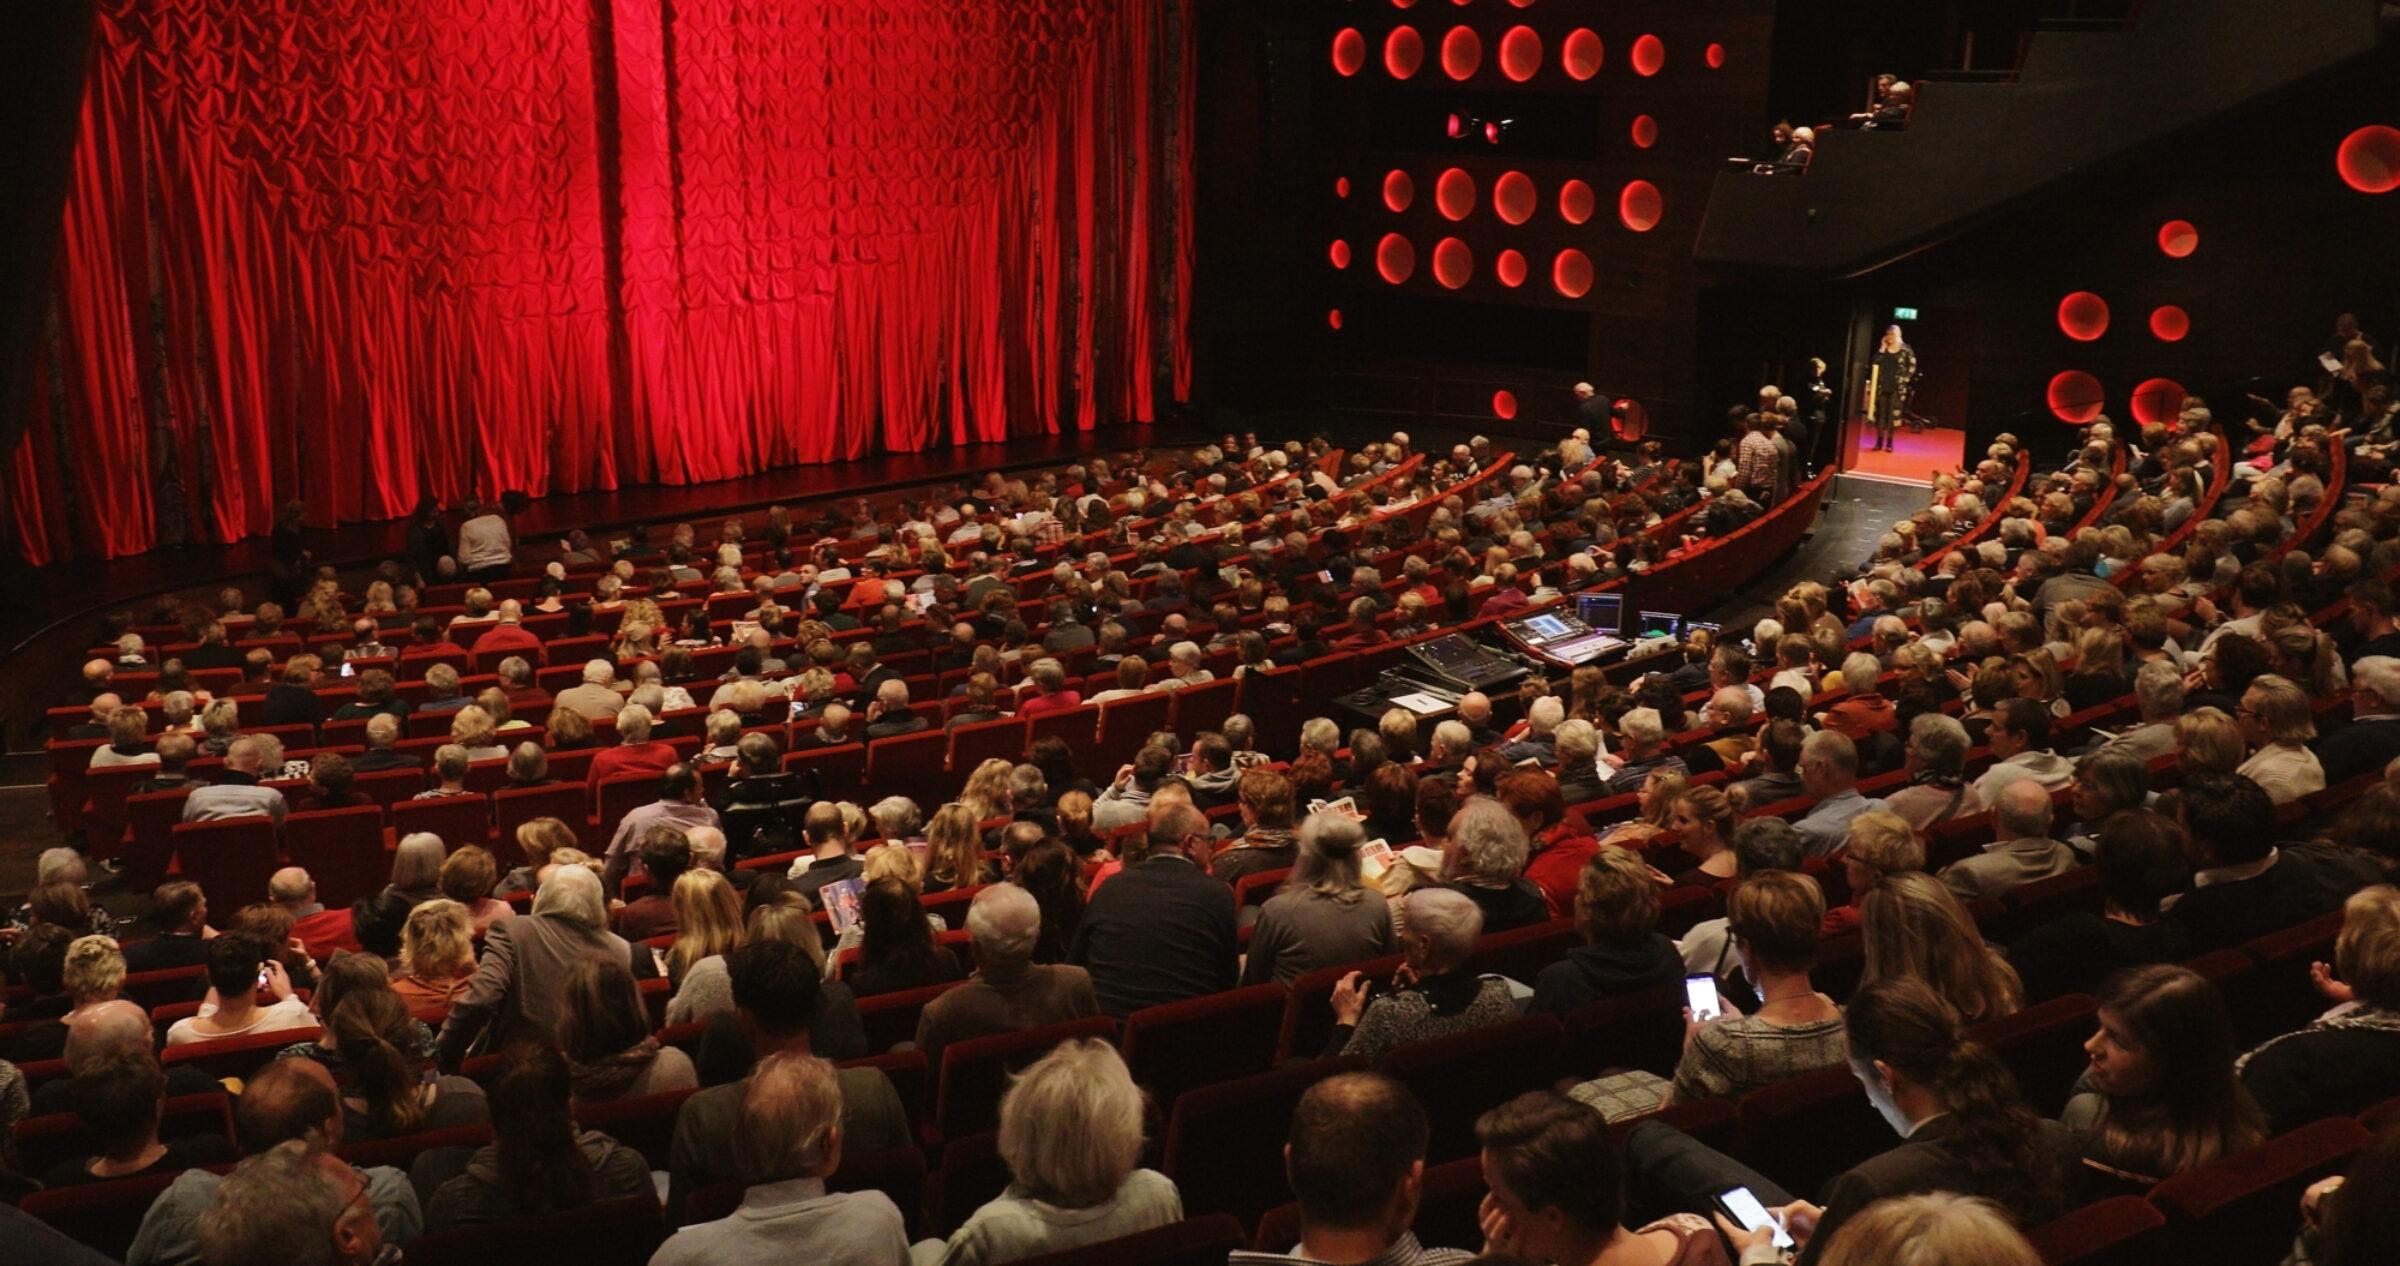 2018 Ebo Fraterman Wilminktheater kunst en cultuur 3905 1582021206 mtime3 D20200218112012